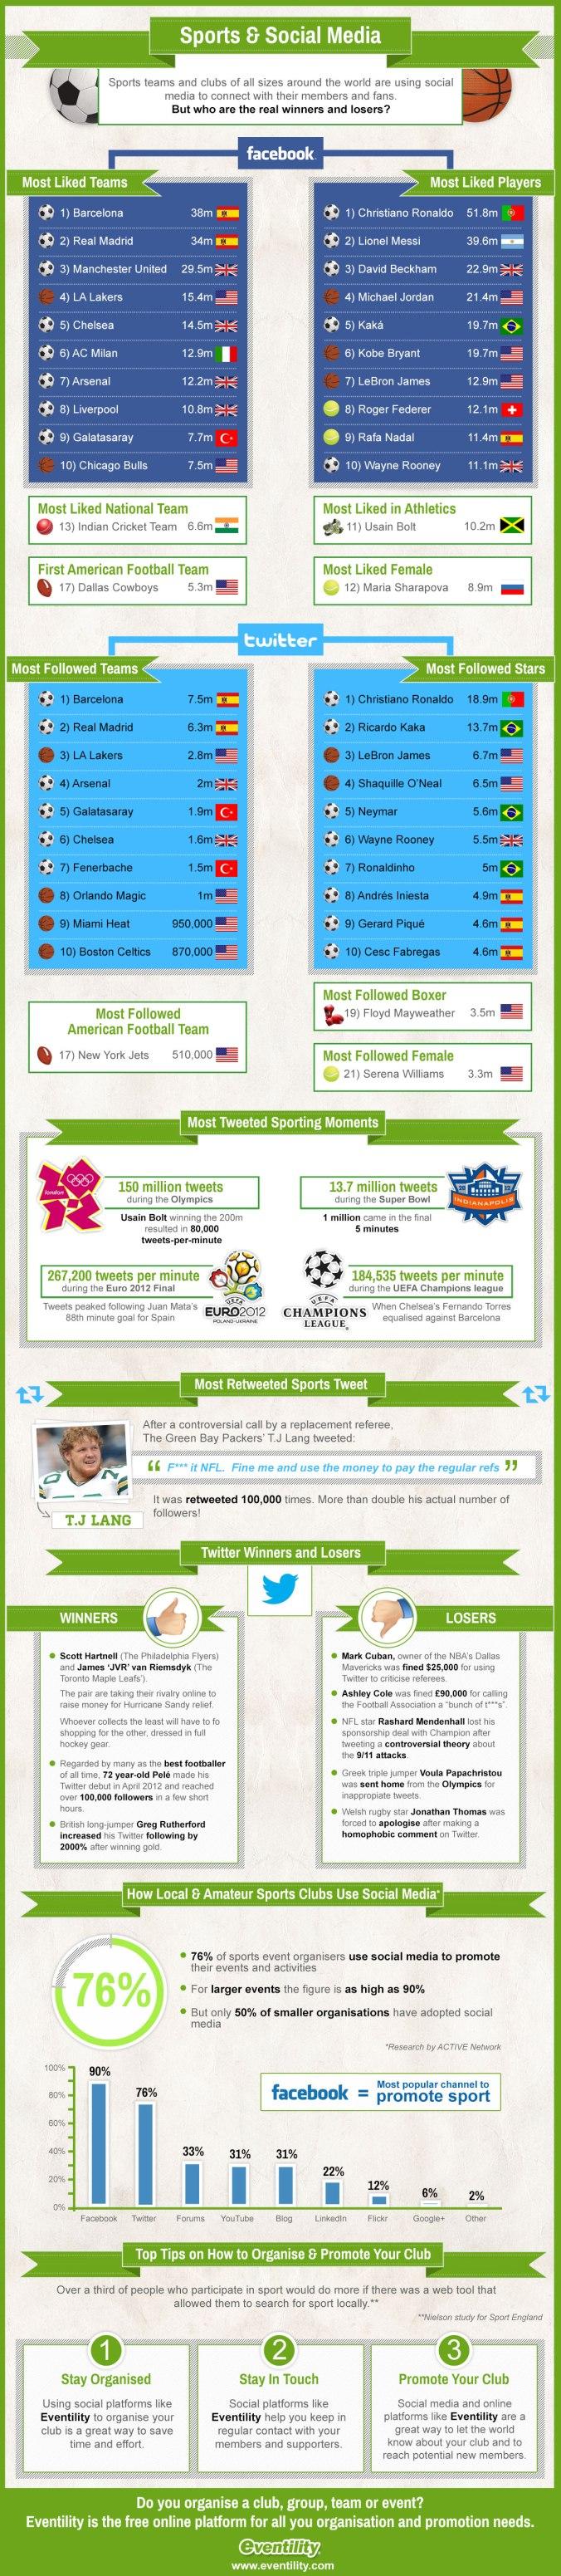 Sports-and-Social-Media2